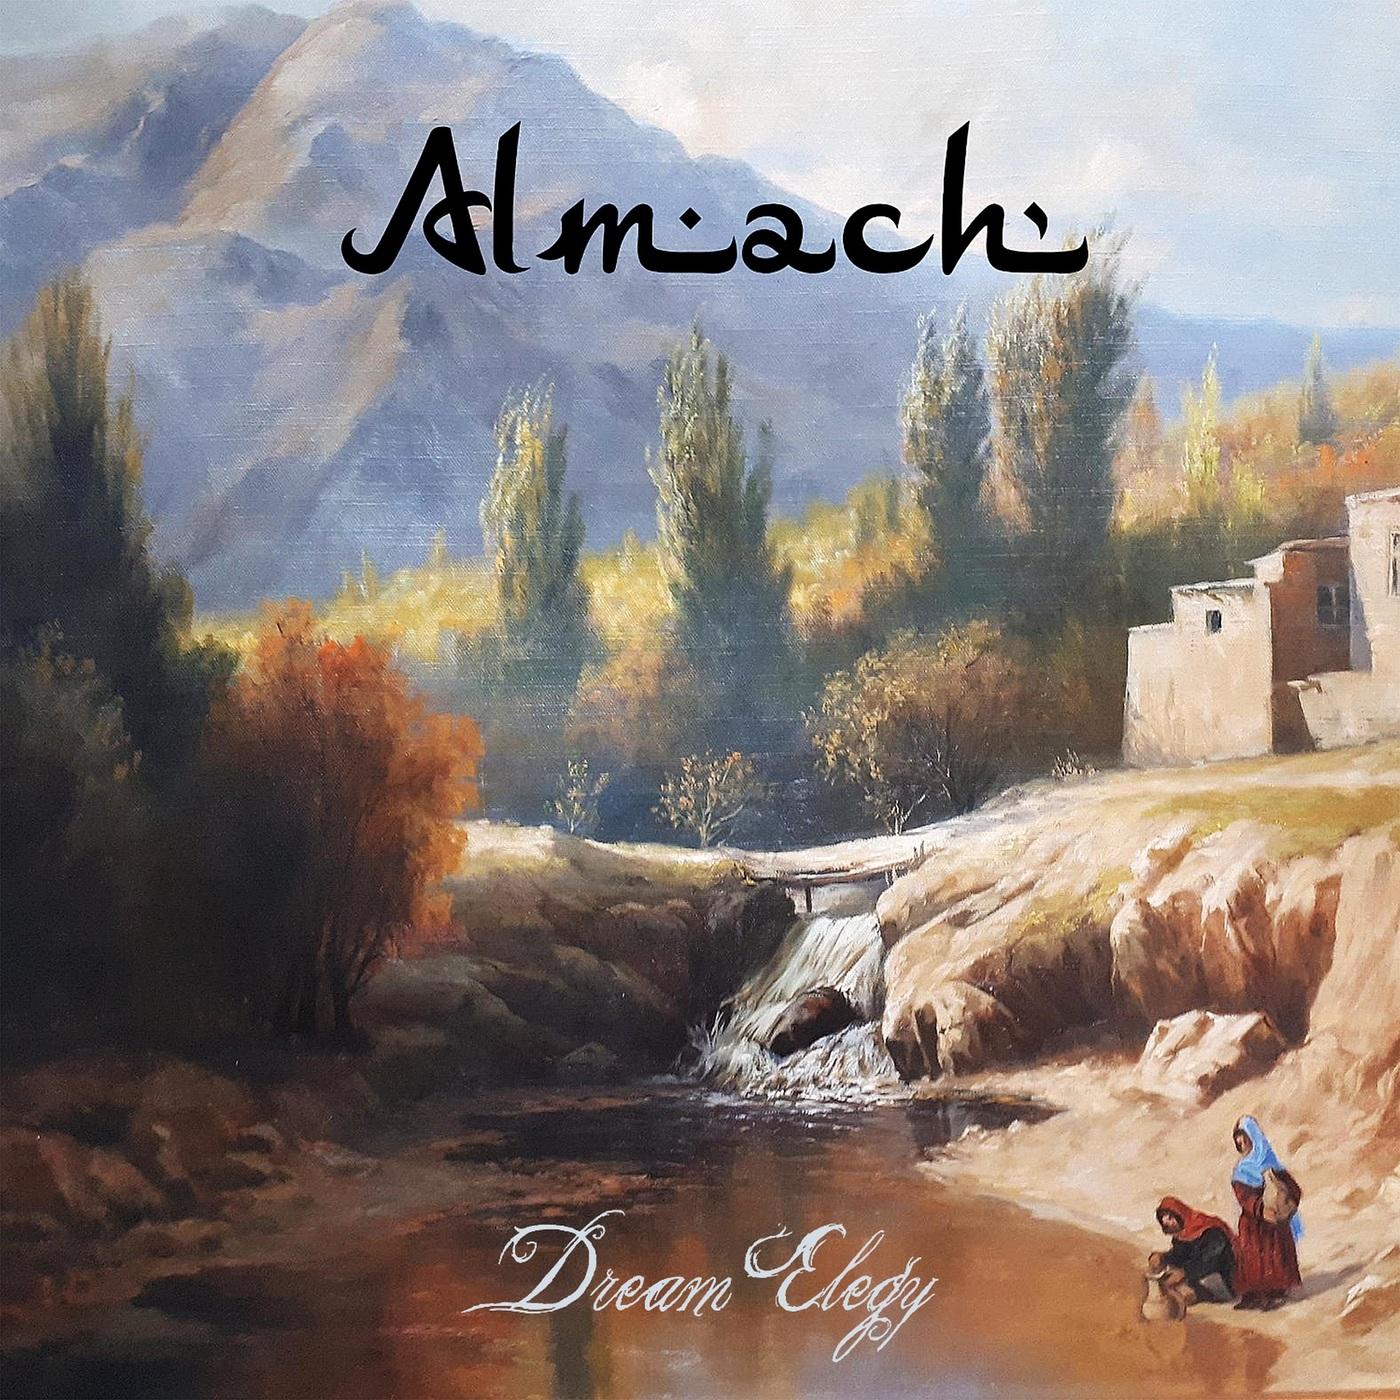 Almach - Dream Elegy (2021)